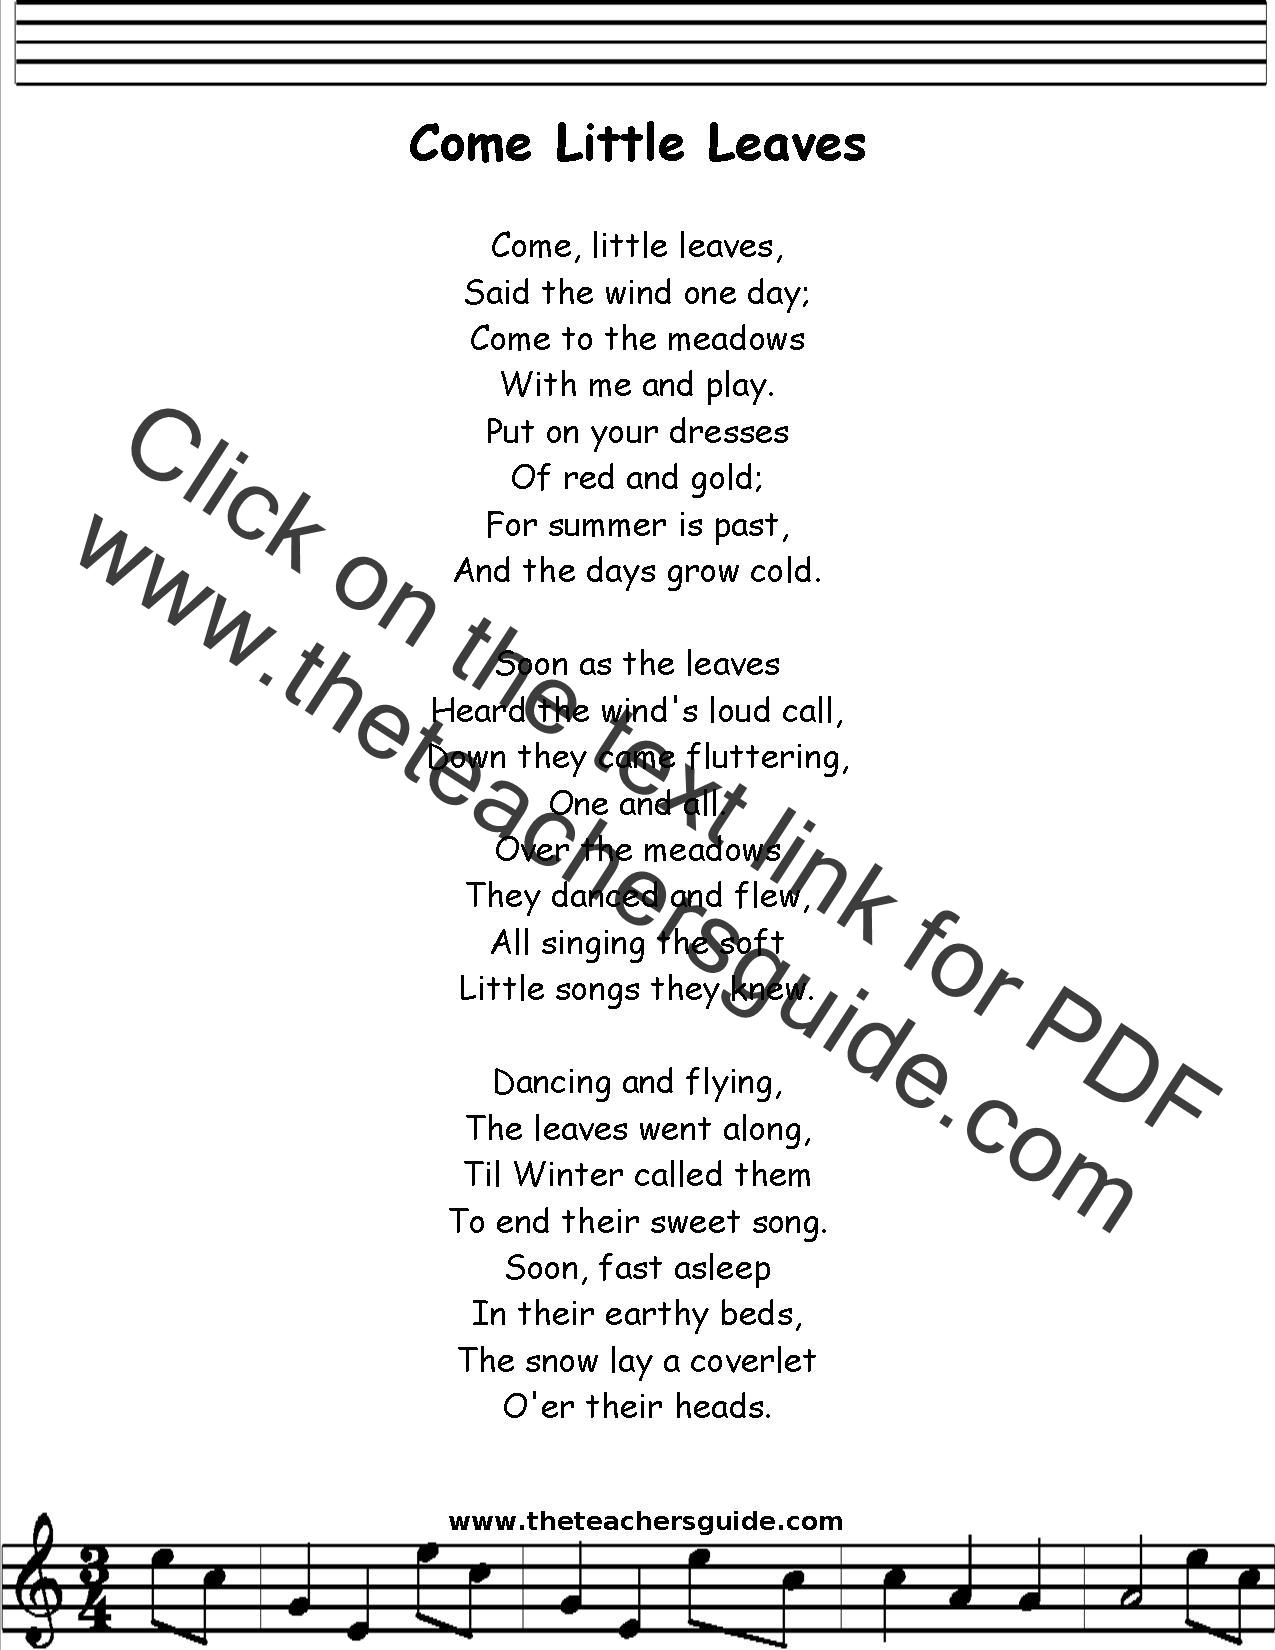 Come Little Leaves Lyrics Printout Midi And Video